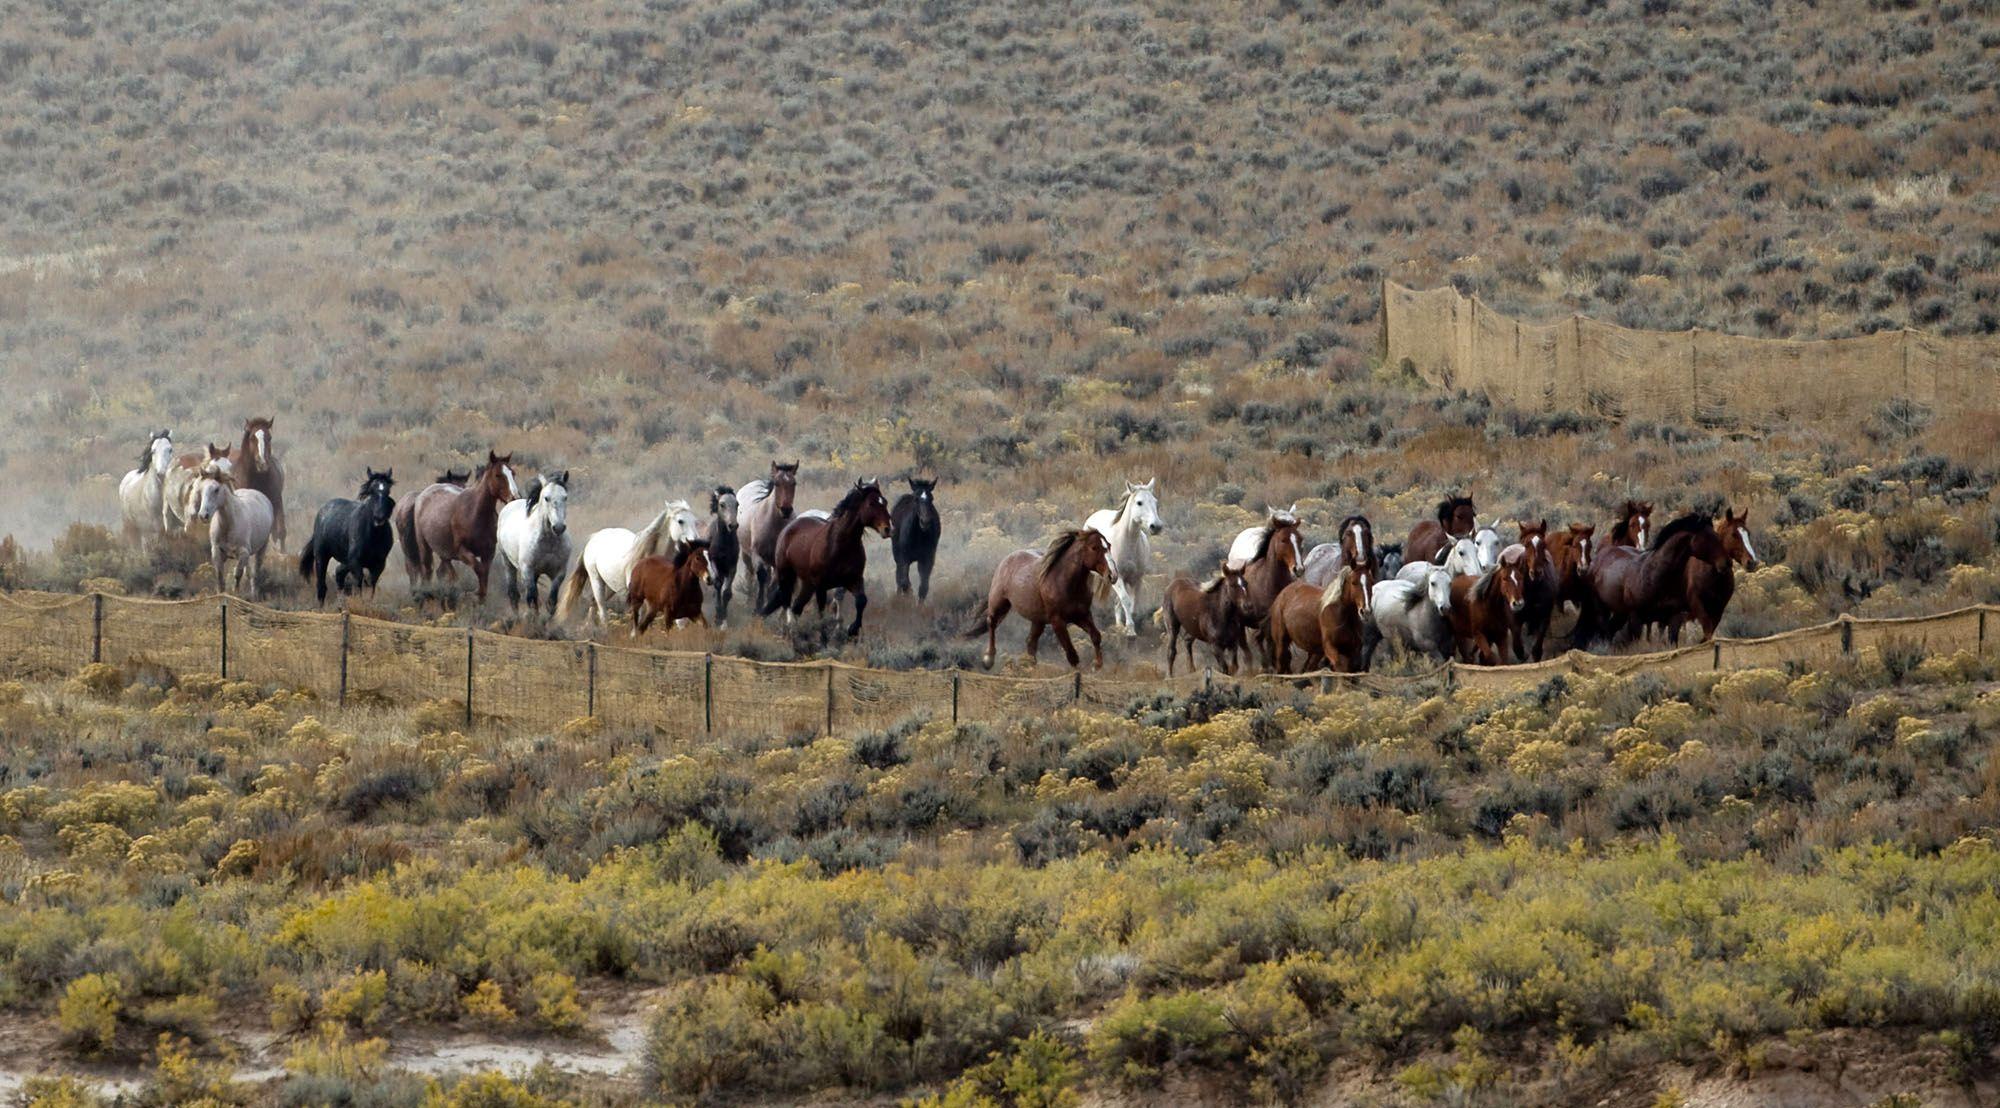 Horses running on a field.